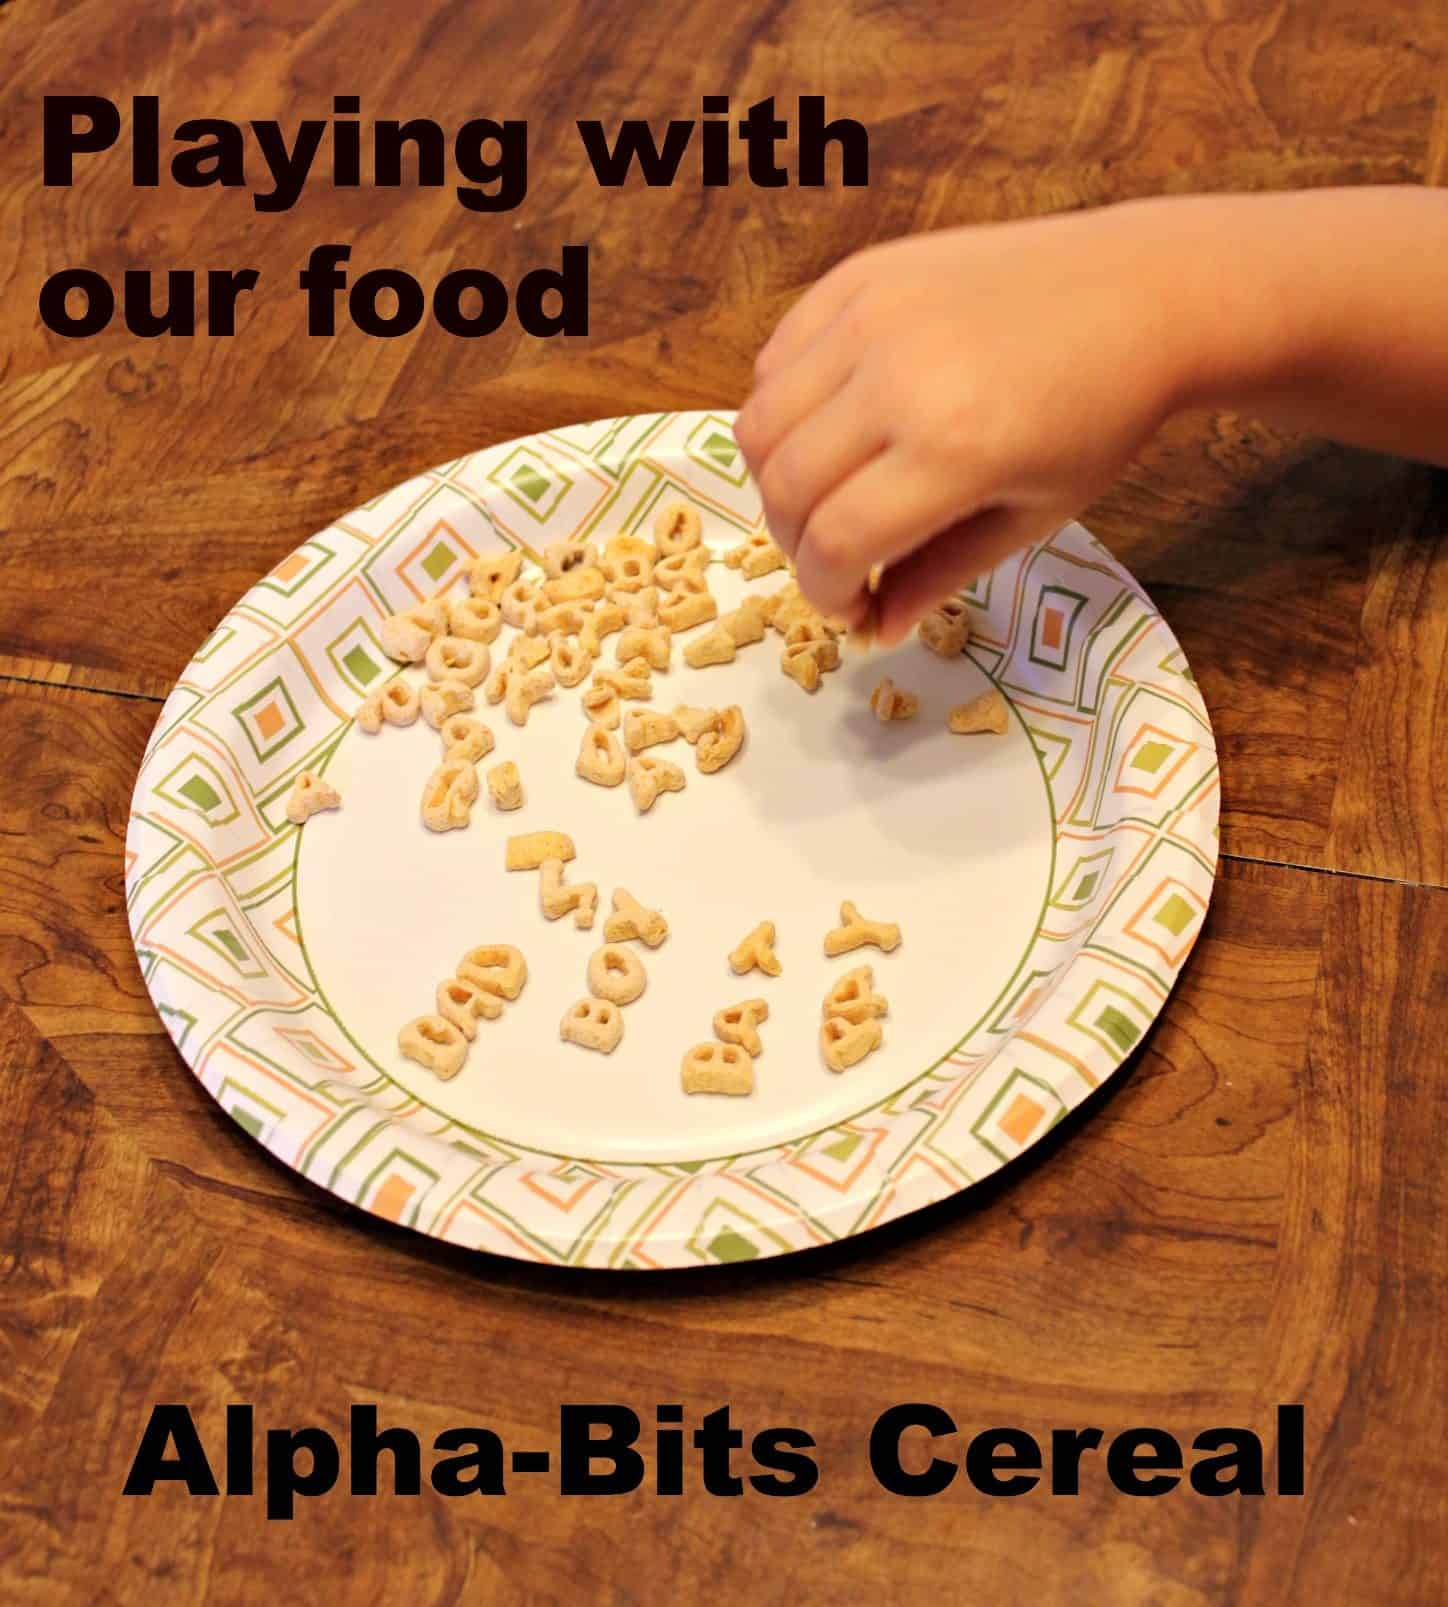 Alpha-Bits Having Fun With Food